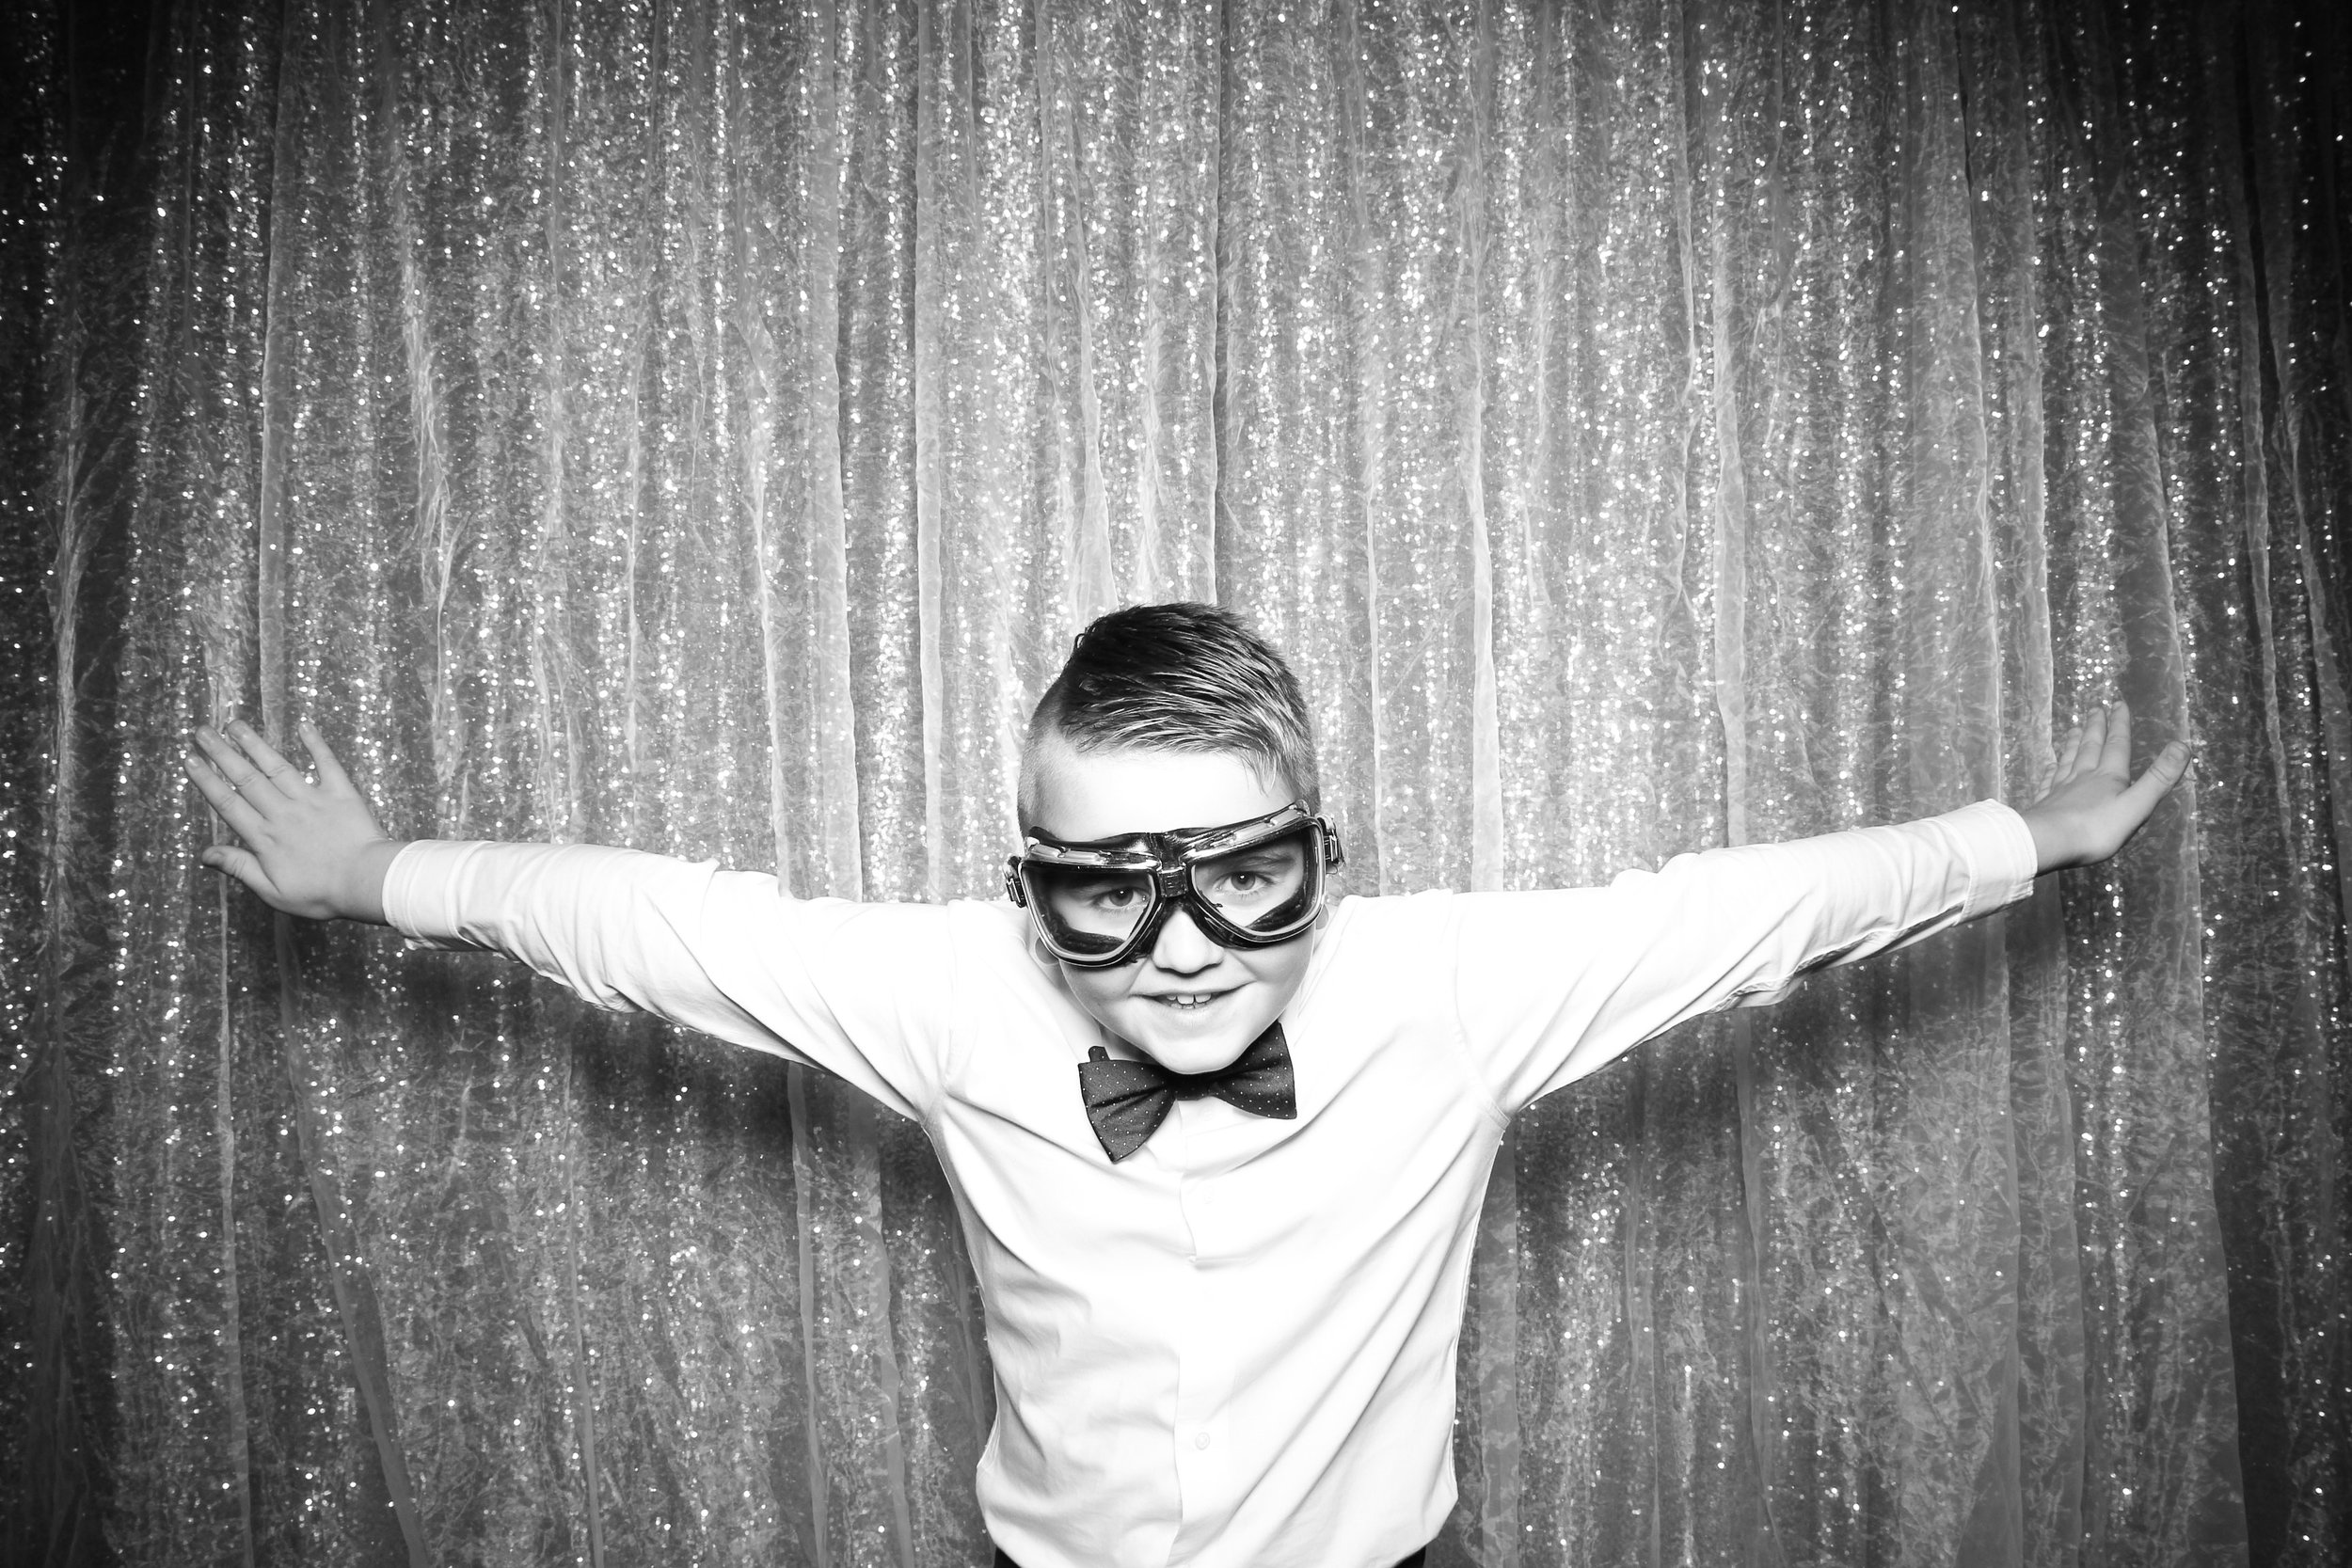 JW_Marriott_Burnham_Ballroom_Wedding_Photo_Booth_06.jpg